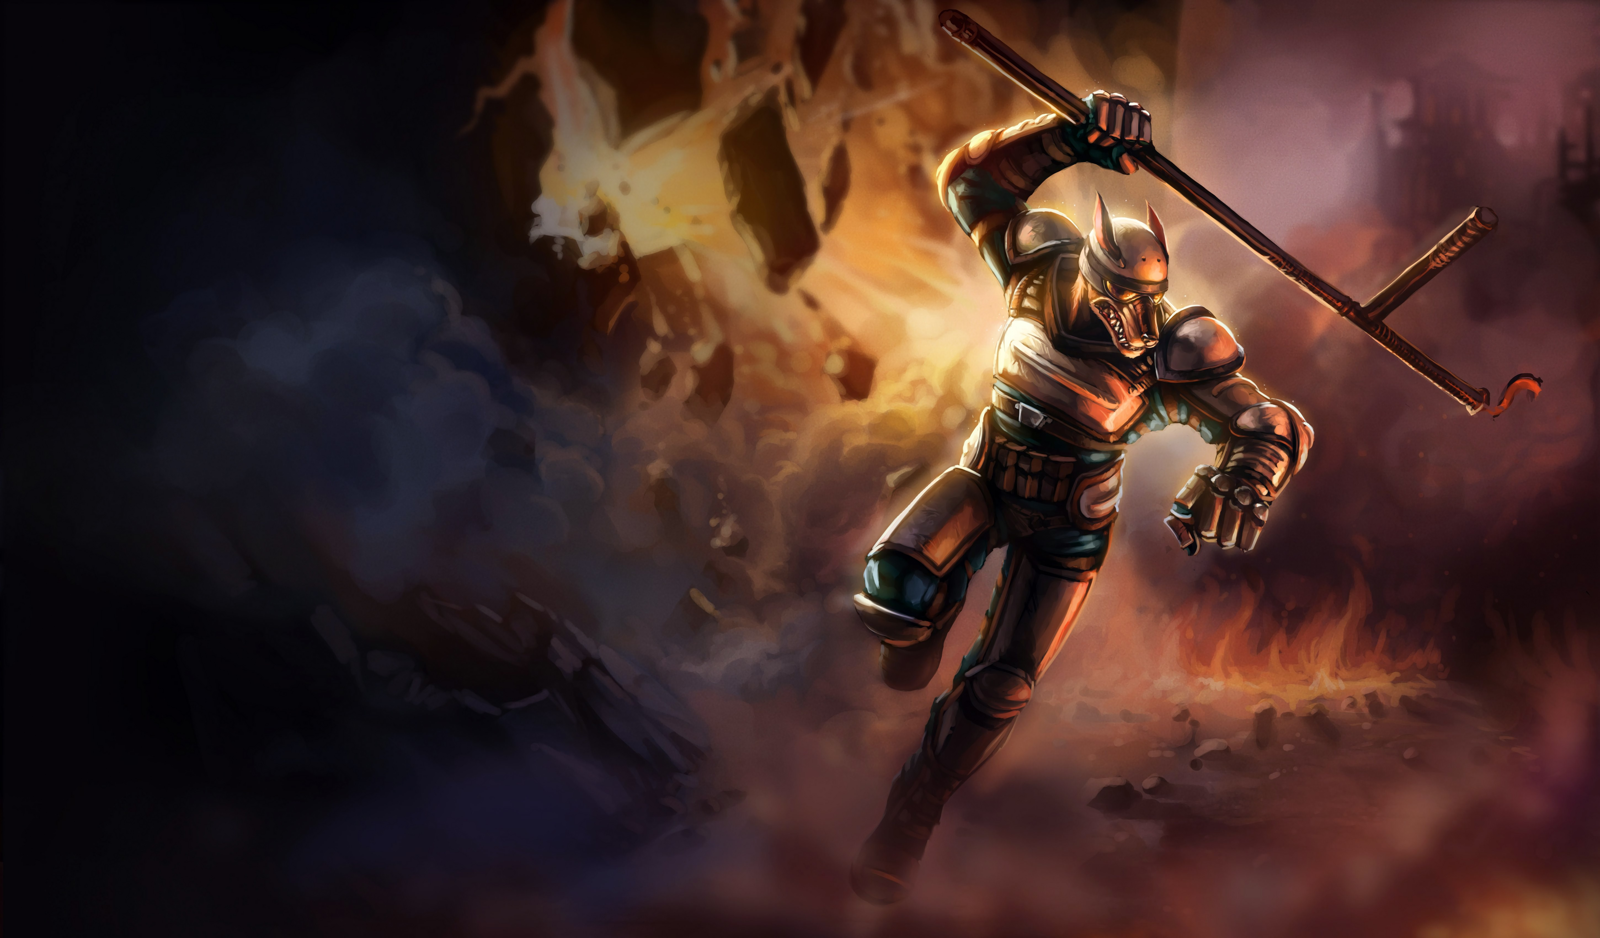 Riot K-9 Nasus Splash Art HD 4k 6k Wallpaper Background Official Art Artwork League of Legends lol